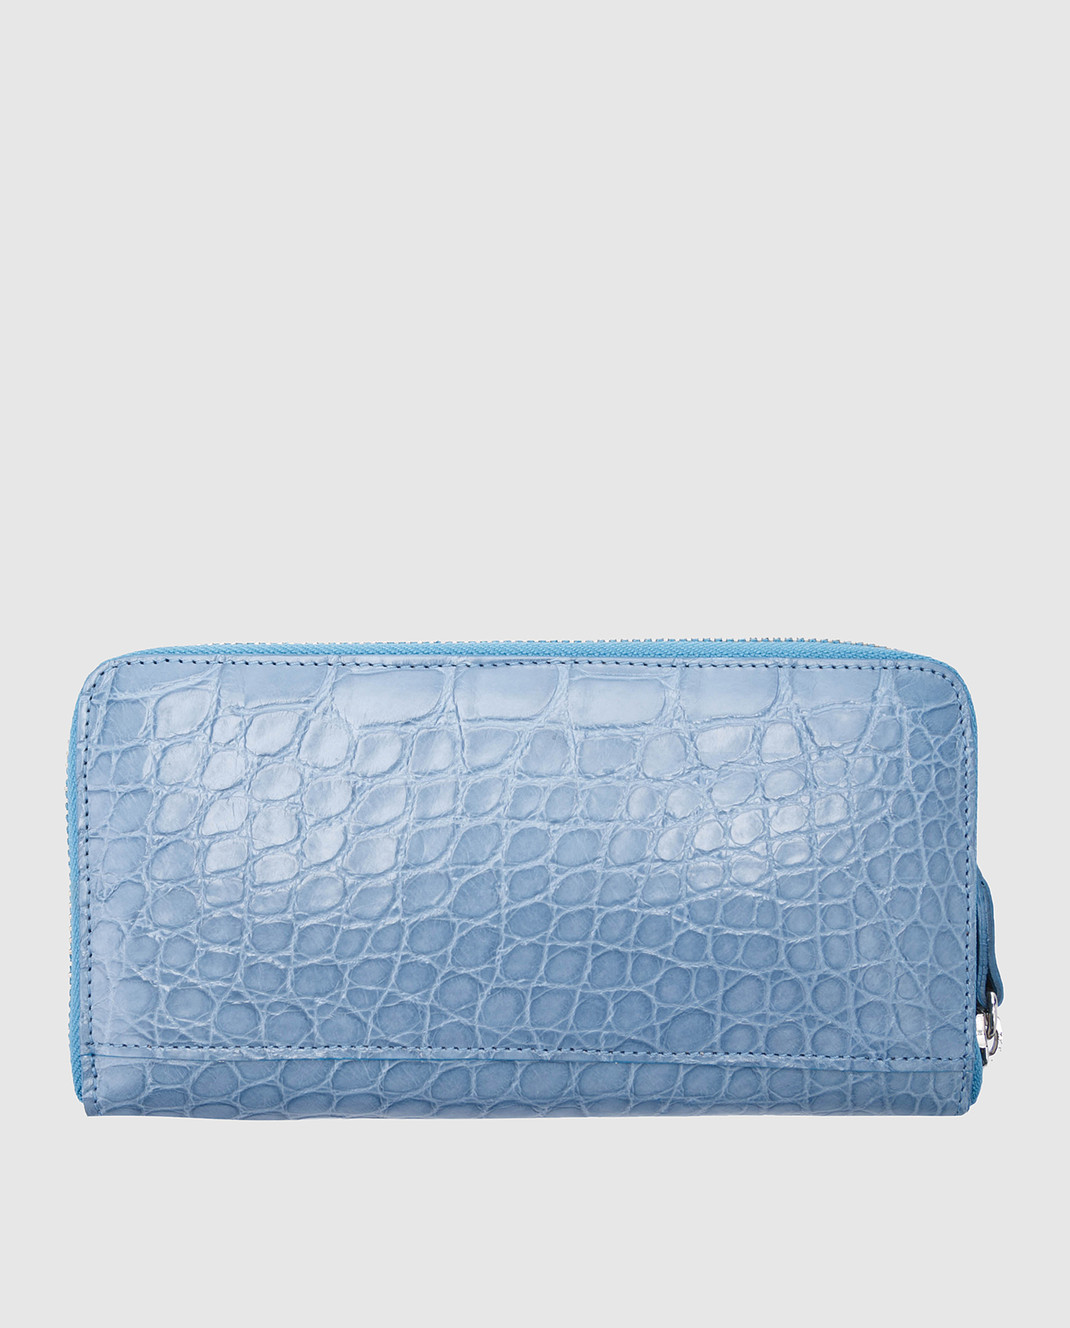 Bochicchio Голубой кожаный кошелек изображение 1